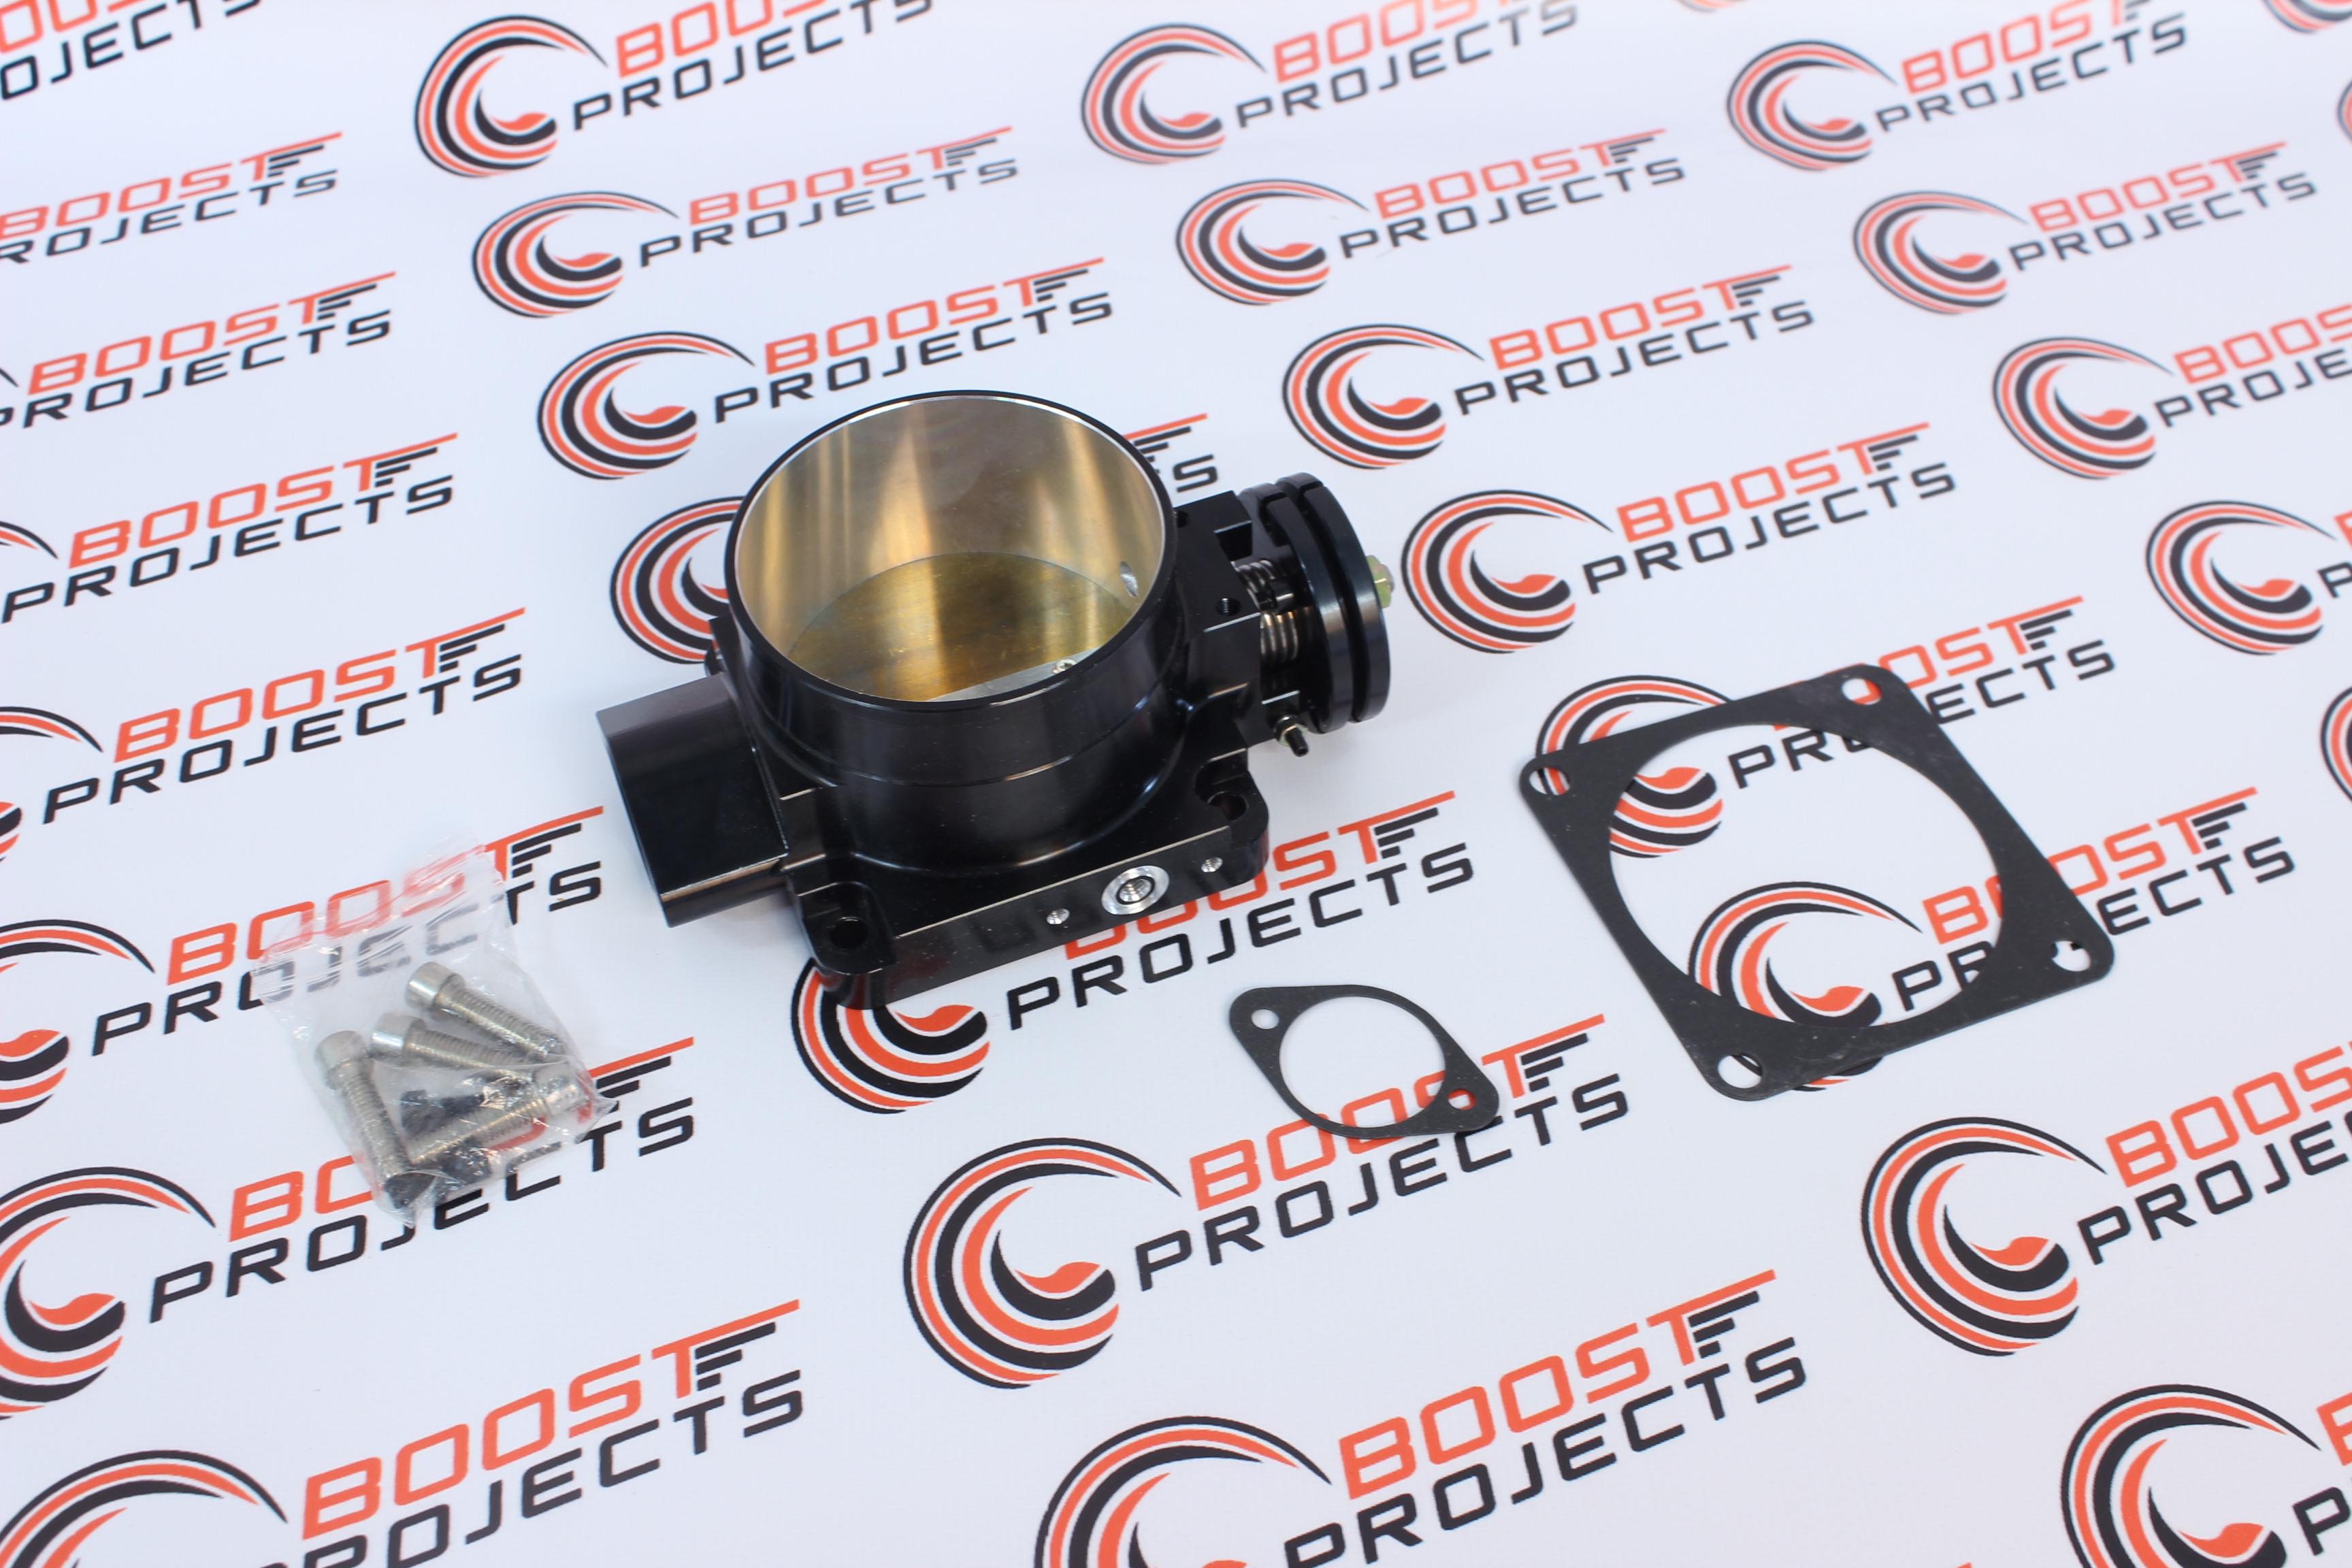 Skunk2 309-05-0115 Pro-Series Billet Throttle Body